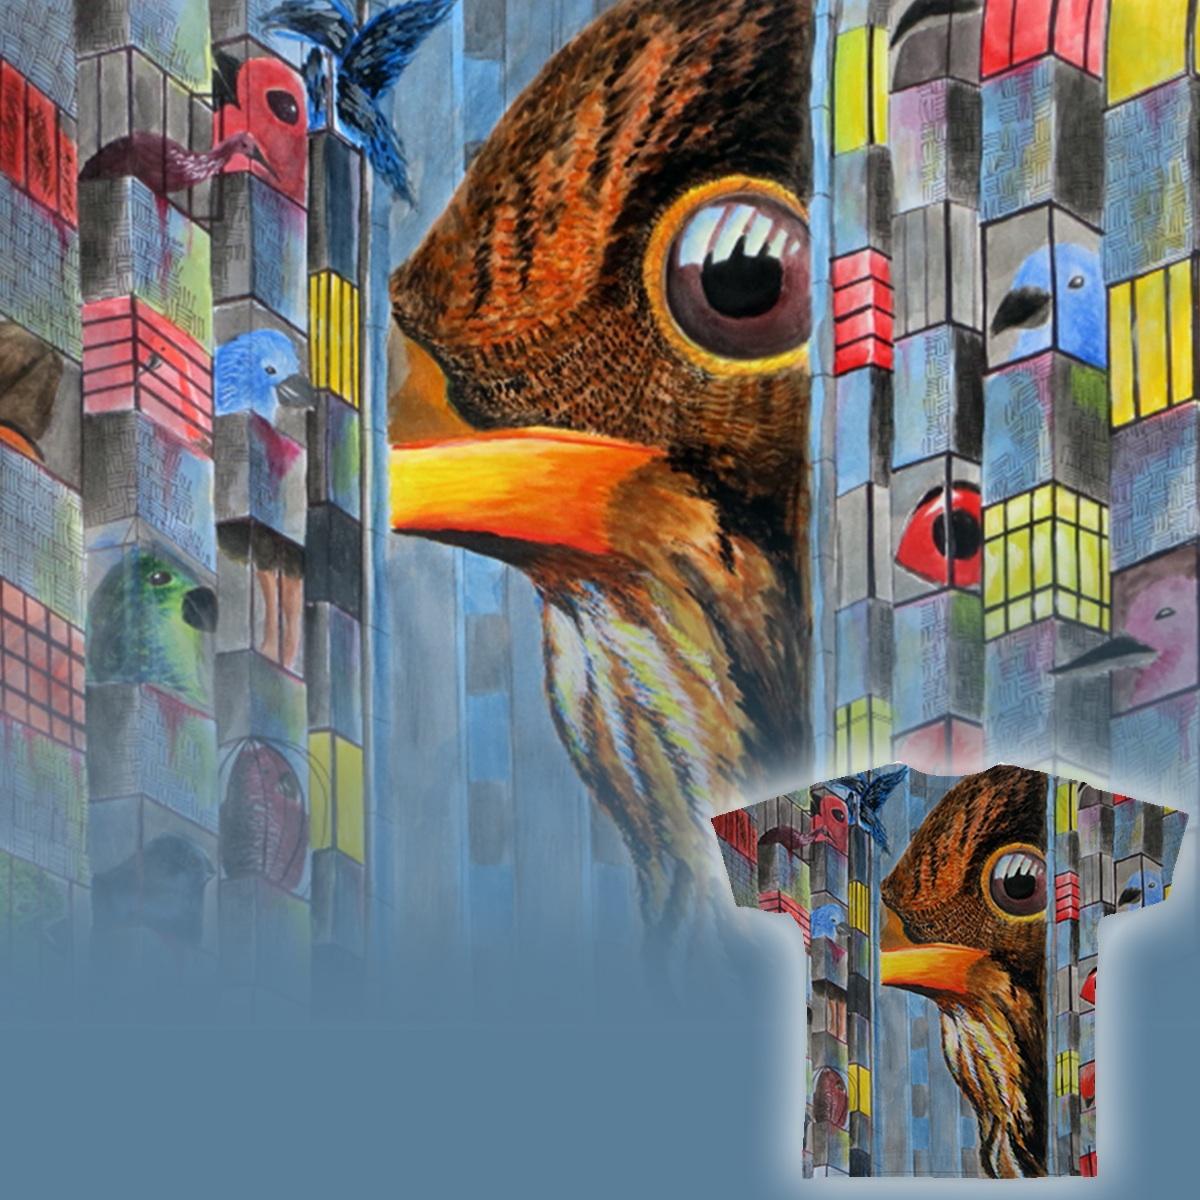 Bird's Eye by PatriciaChang on Threadless